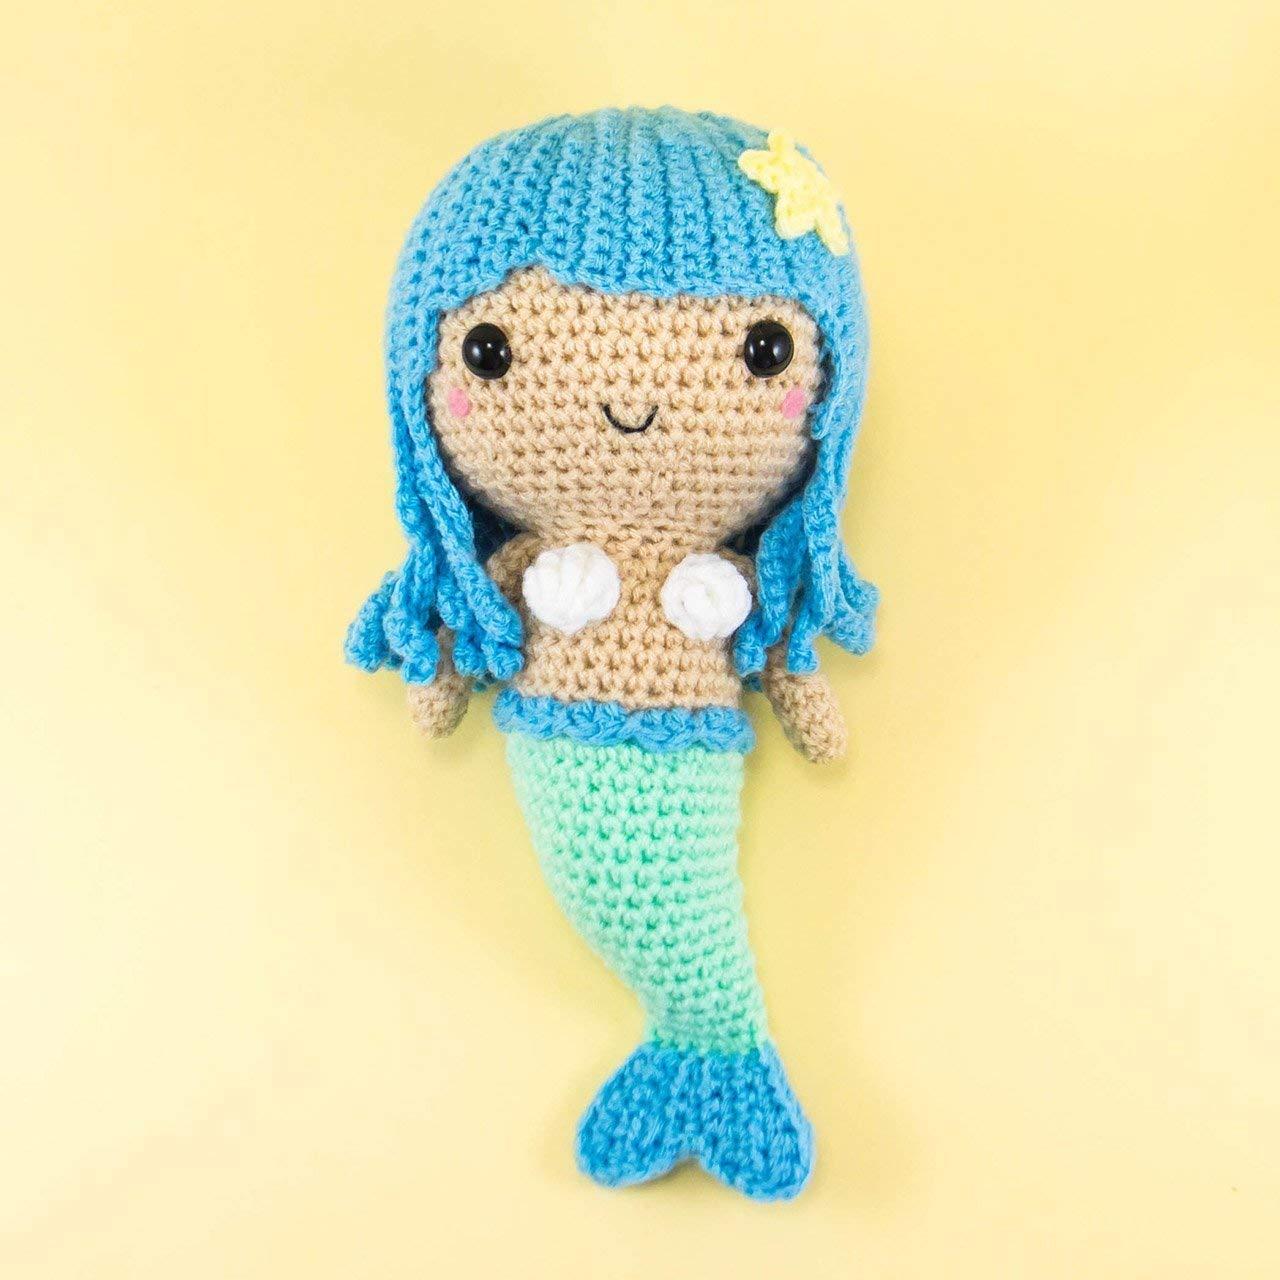 The Friendly Mermaid Crochet Doll - thefriendlyredfox.com | 1280x1280